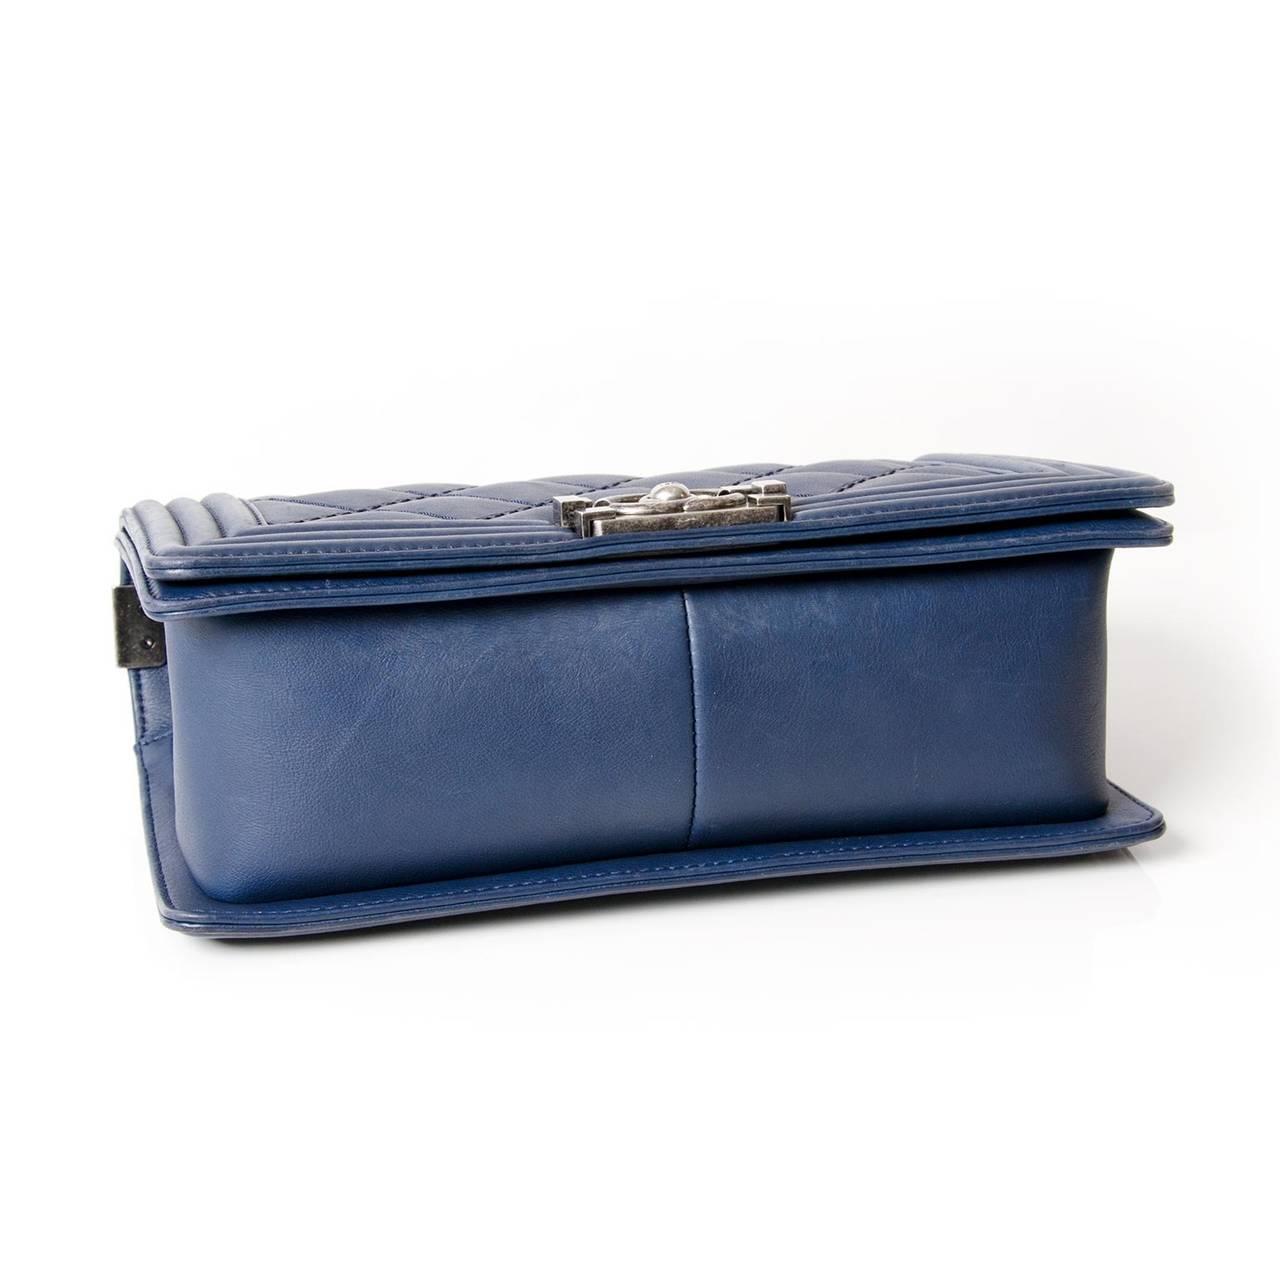 Chanel Lambskin Medium Quilted Boy Bag 5